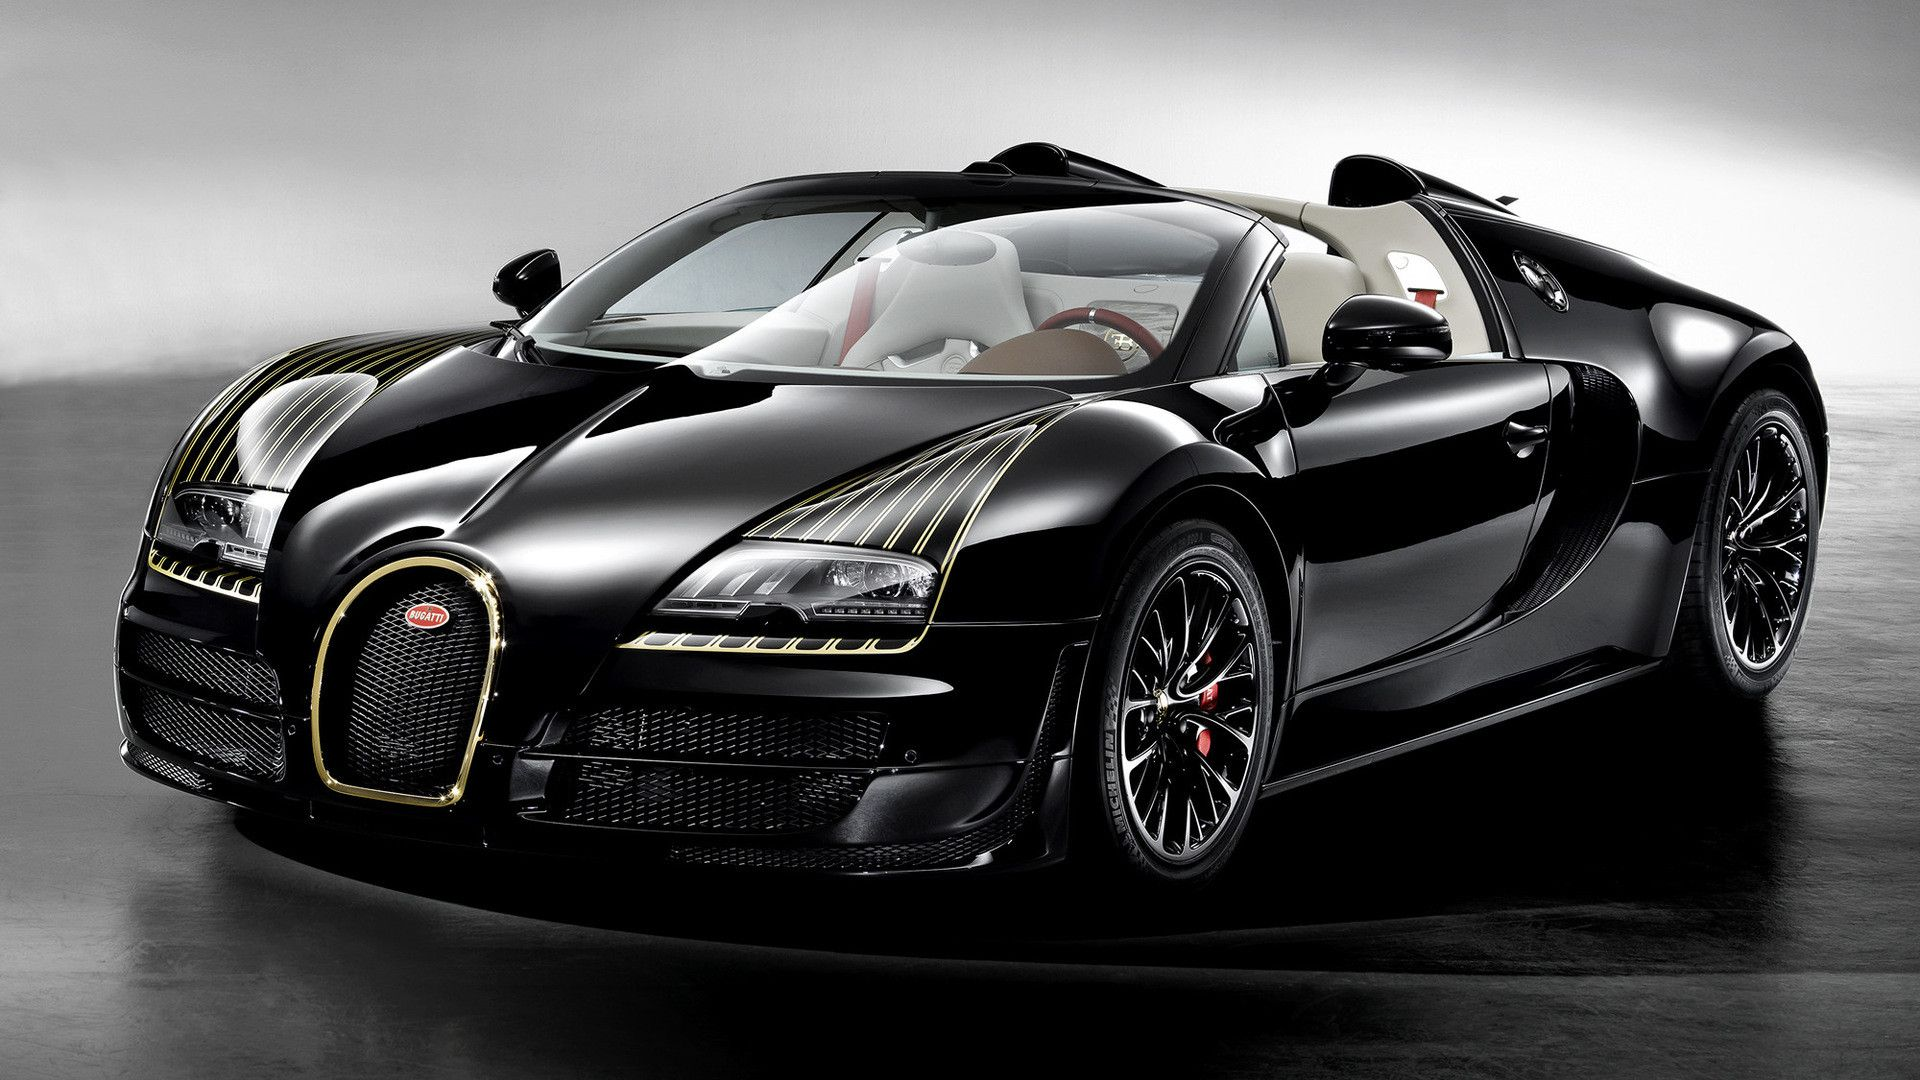 Black Bugatti Wallpapers Top Free Black Bugatti Backgrounds Wallpaperaccess